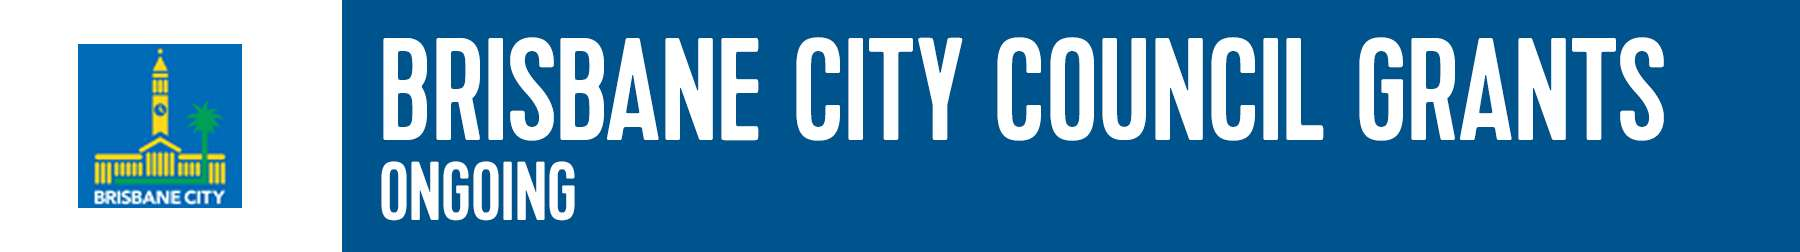 Brisbane City Council Grants